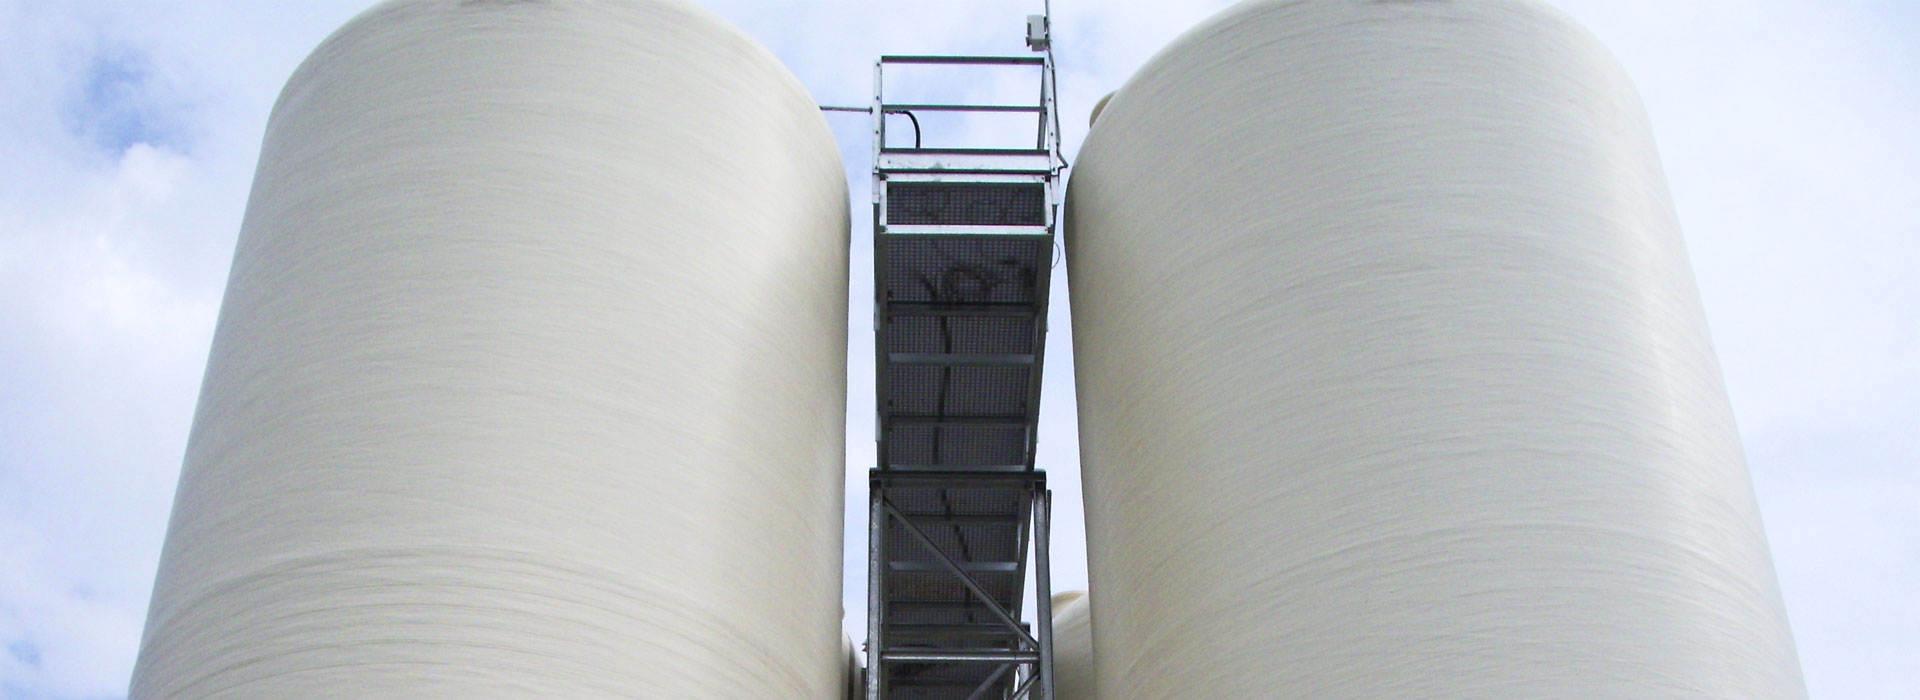 Serbatoi-in-vetroresina-cilindrici